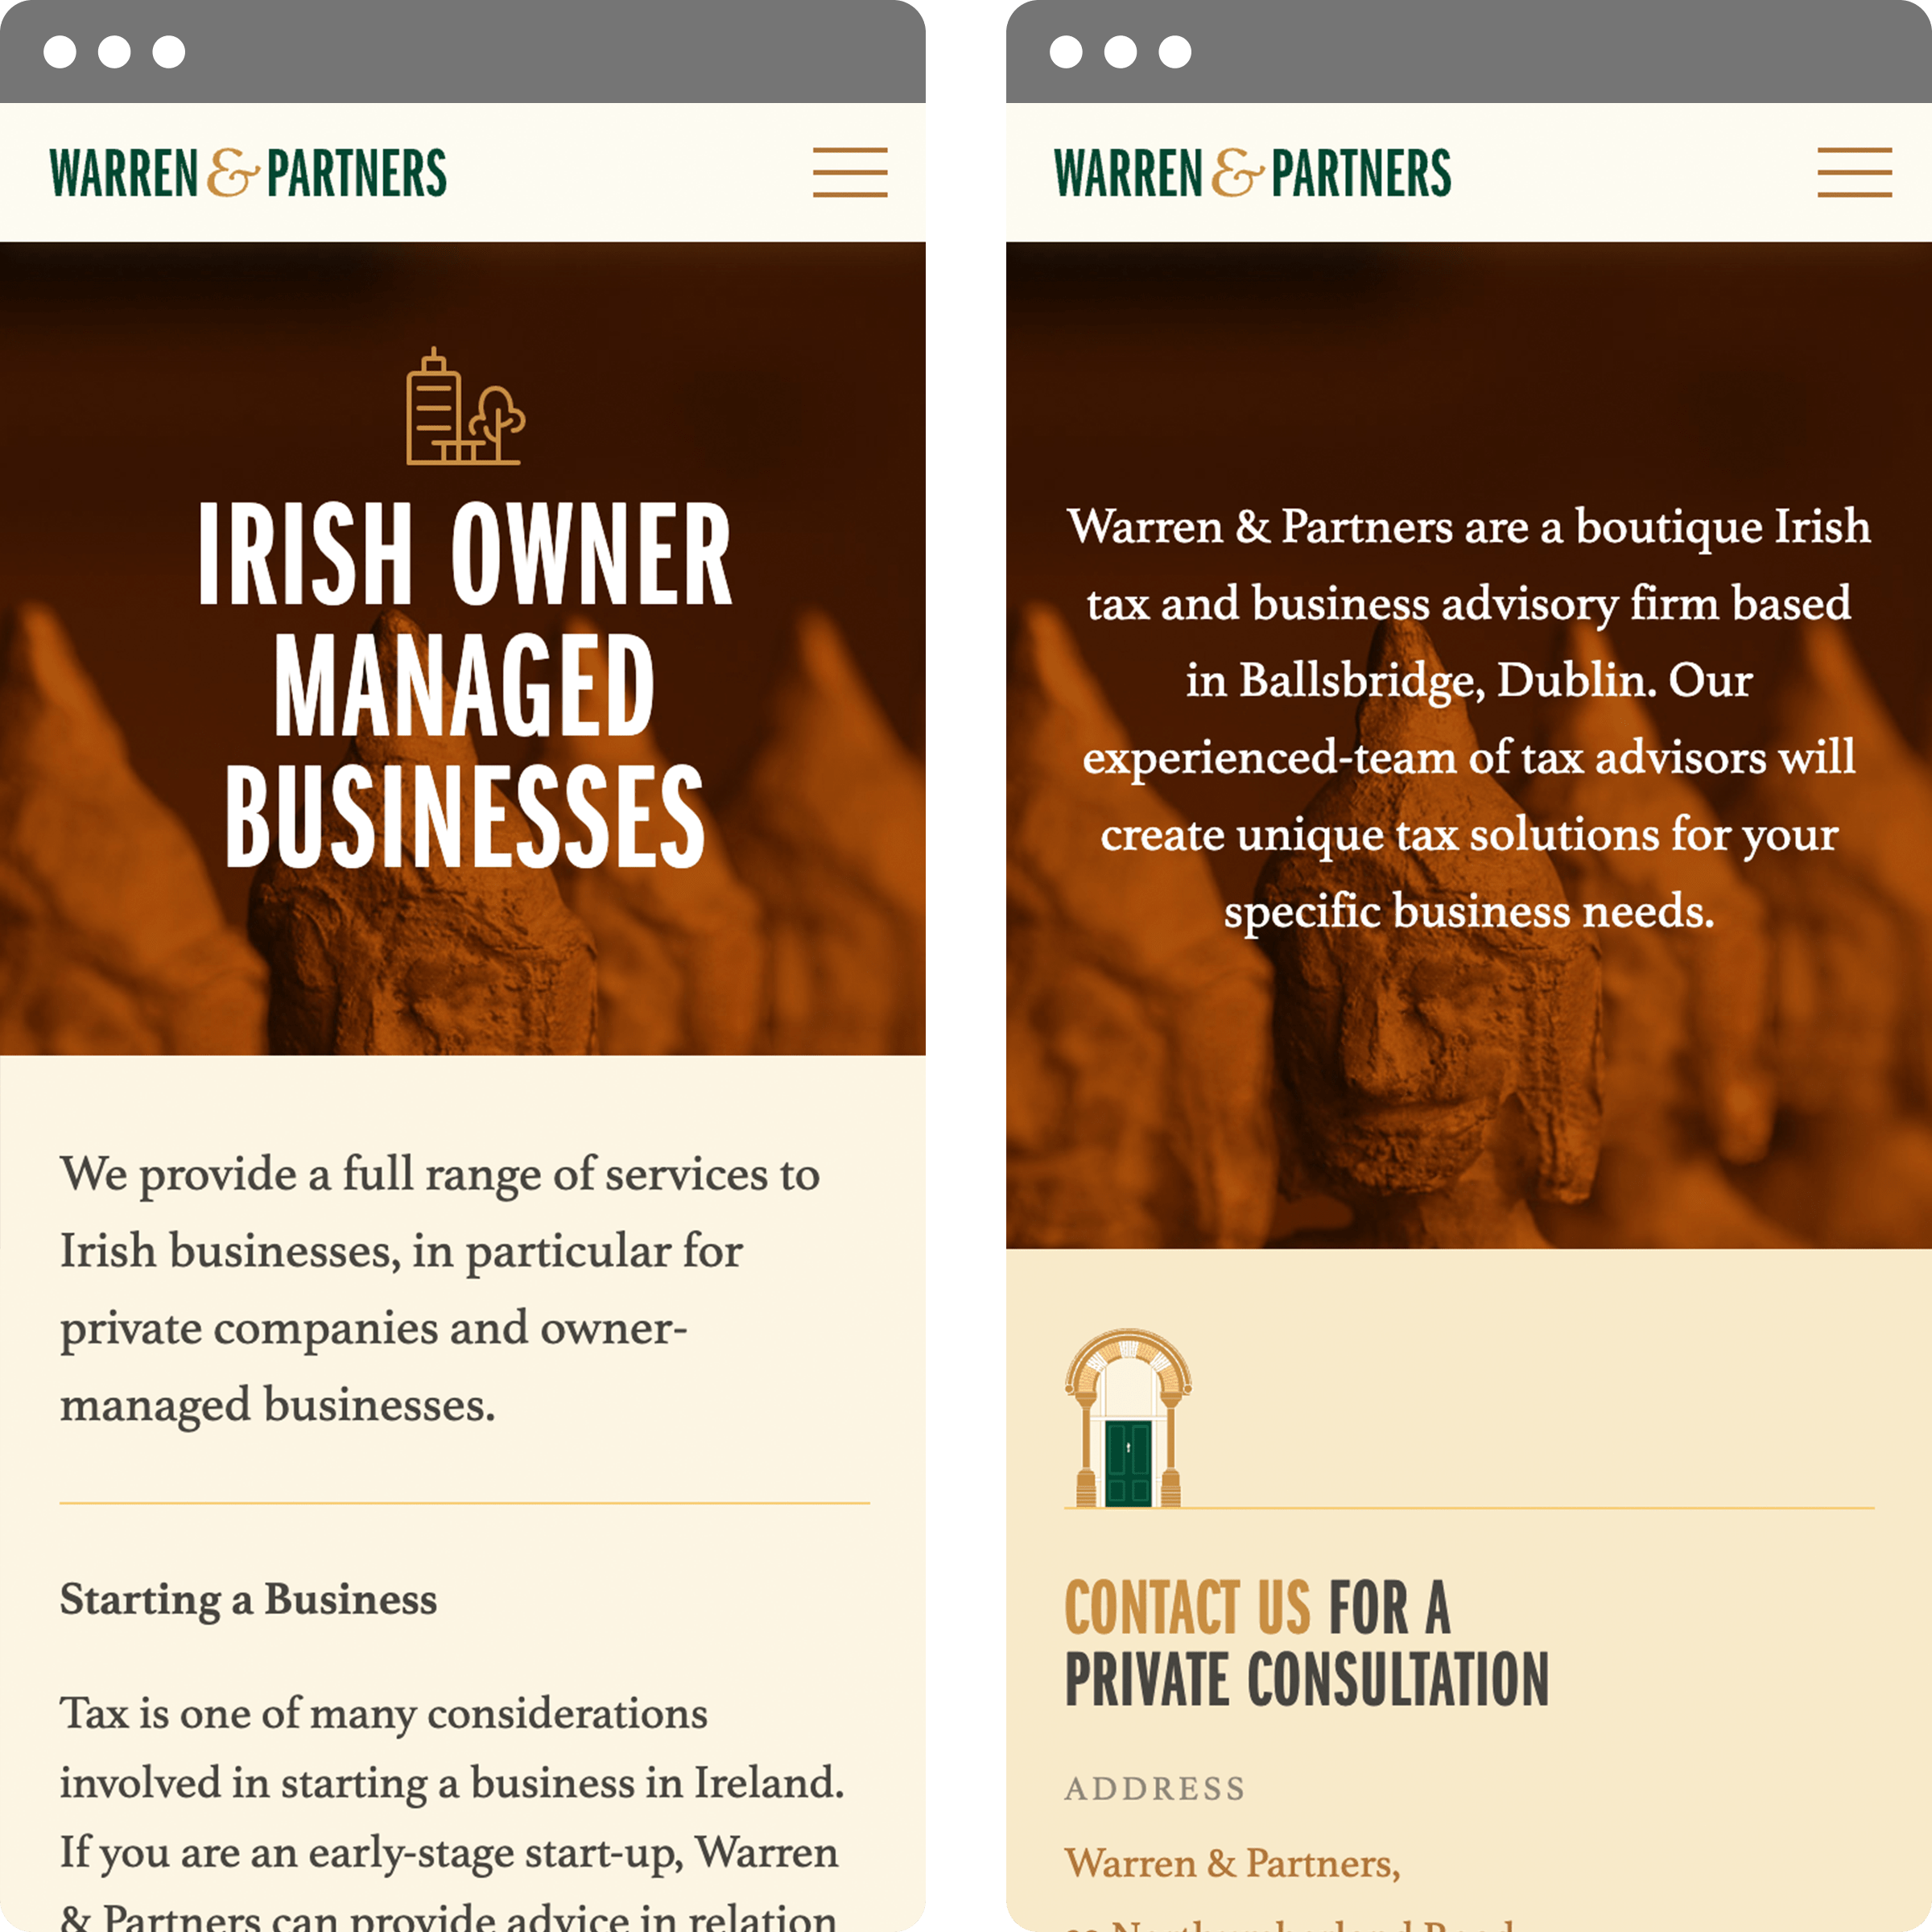 Website design - Mobile views